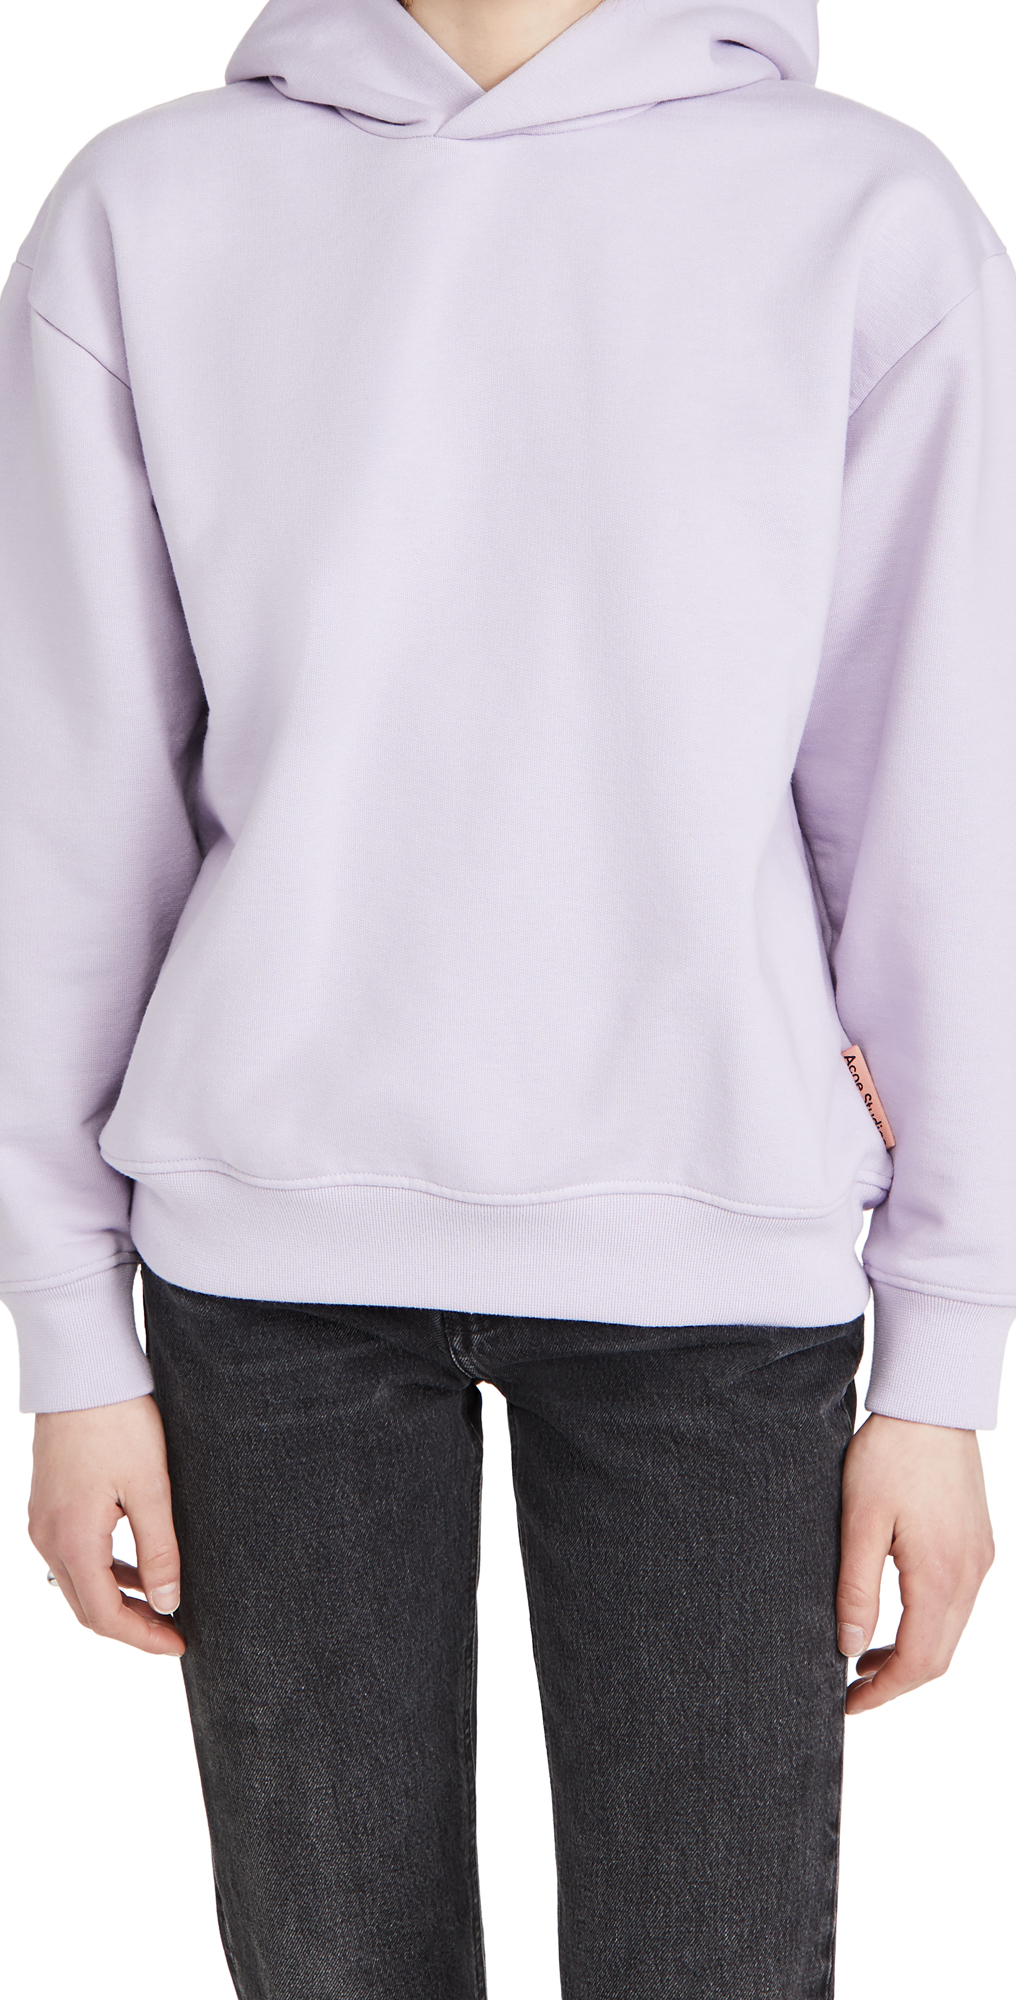 Acne Studios Pullover Sweatshirt